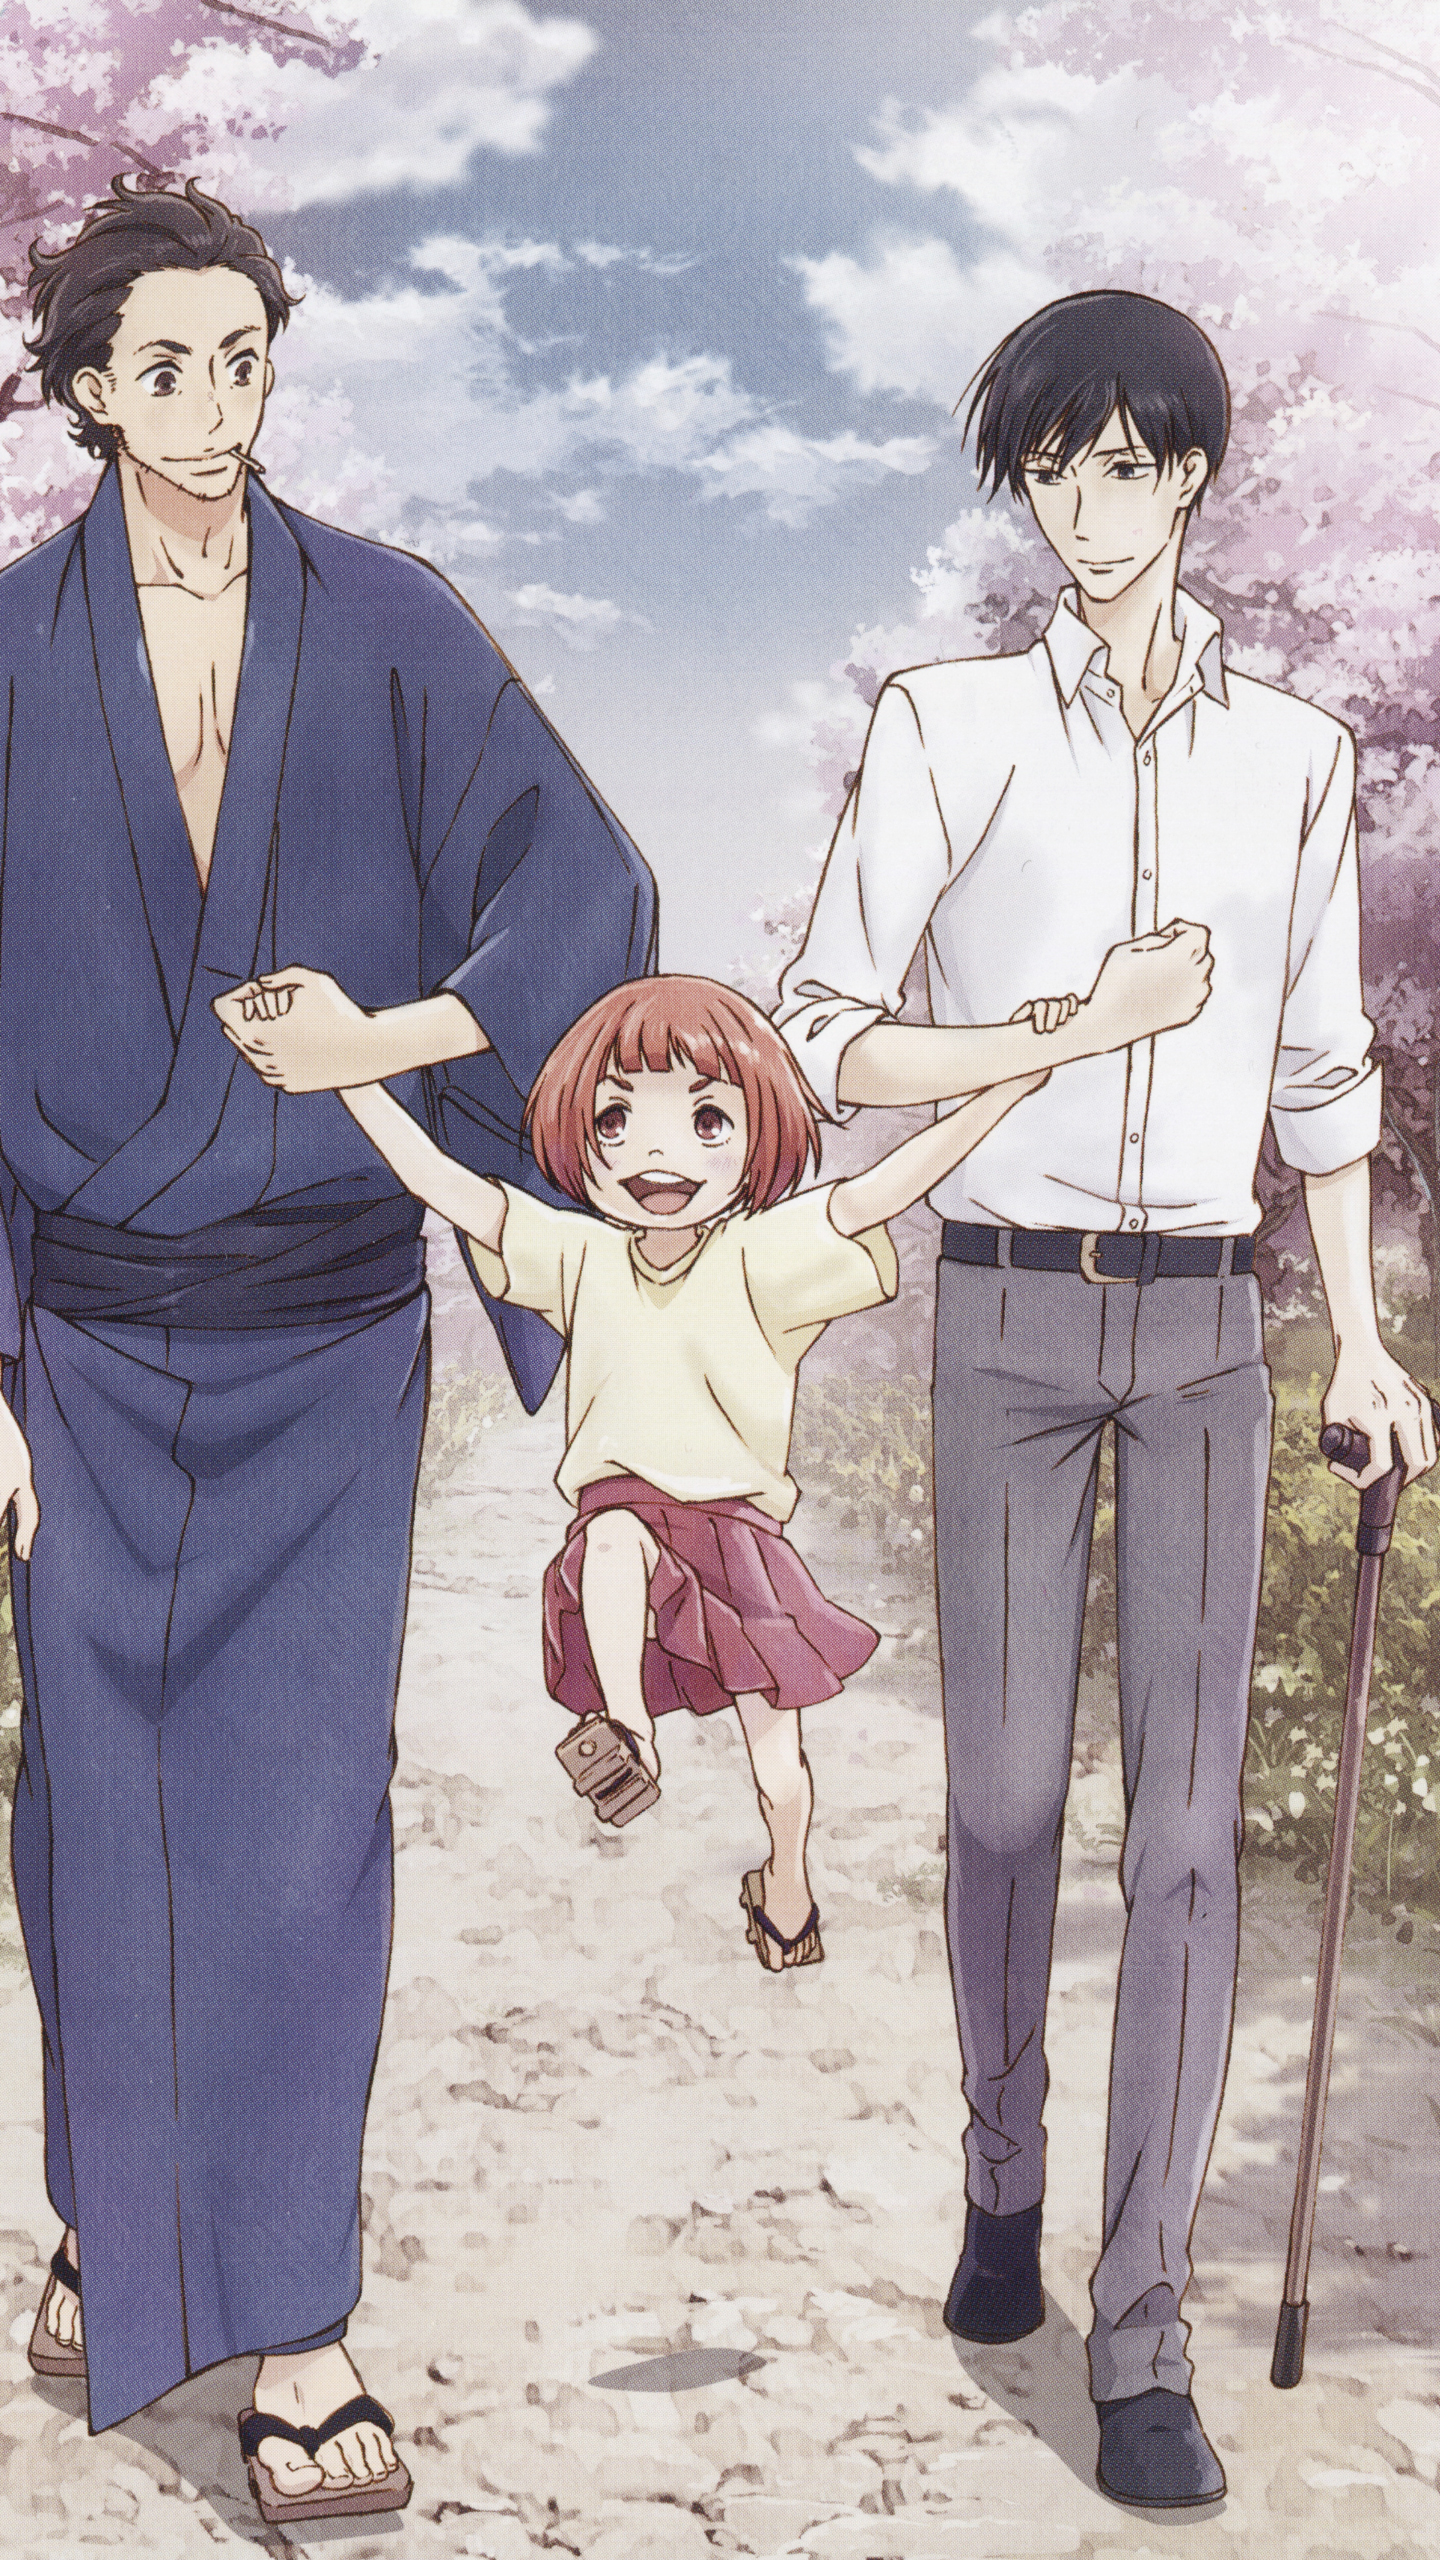 Shouwa Genroku Rakugo Shinjuu Wallpaper Posted By Zoey Cunningham